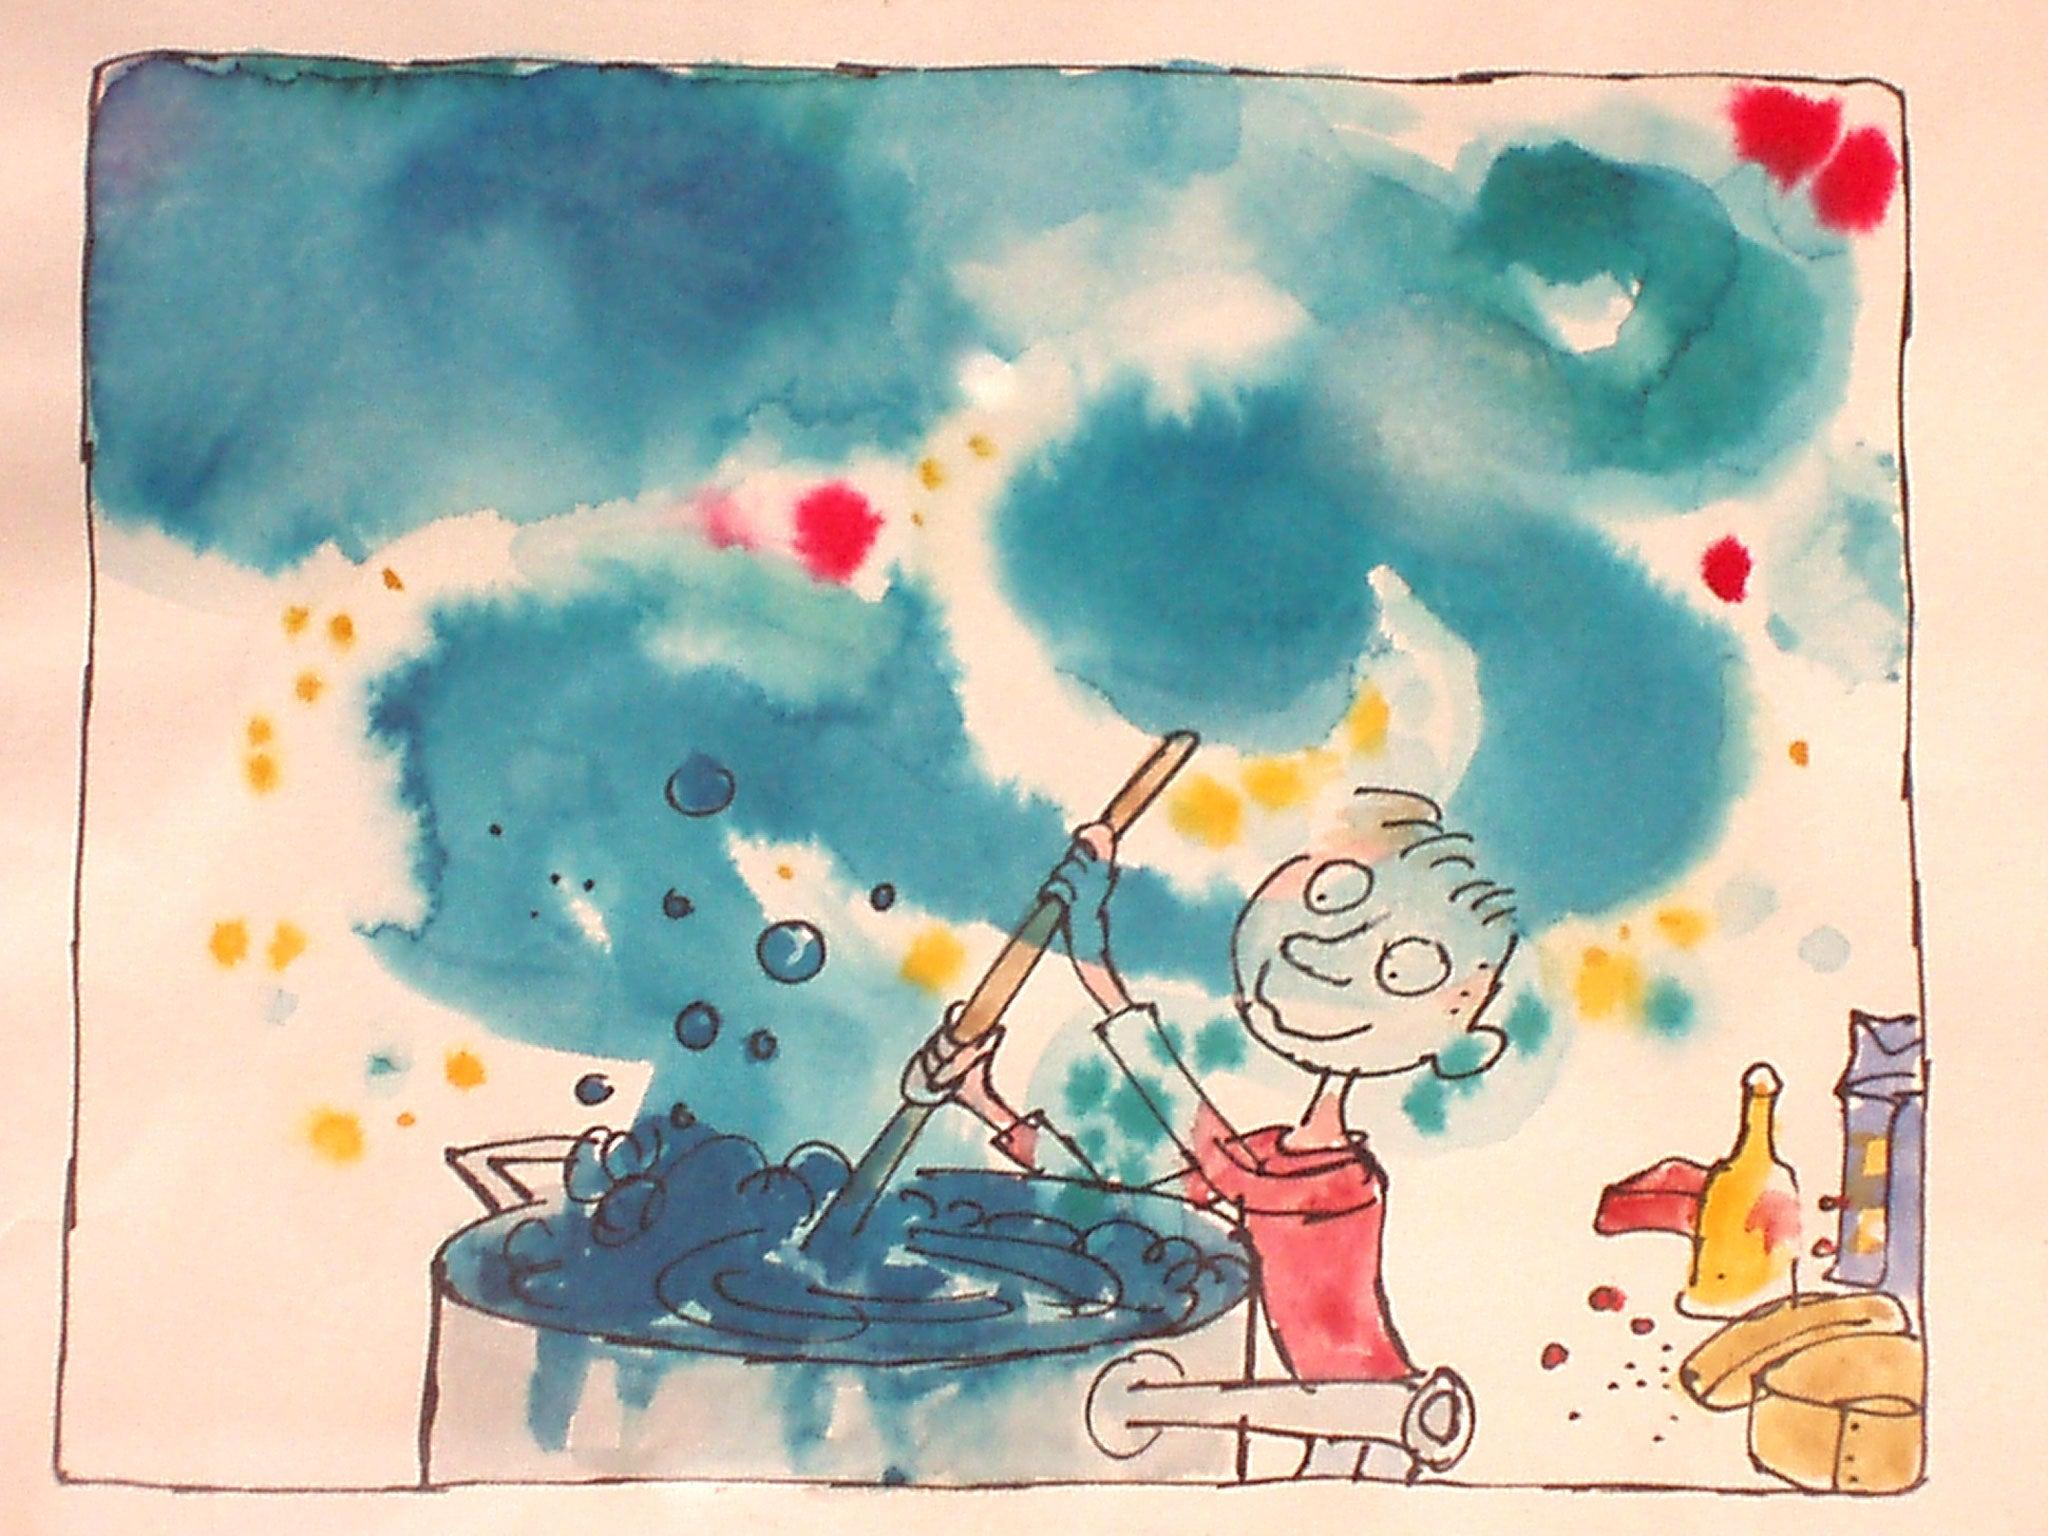 World Book Day 2019: Roald Dahl's 10 best children's books